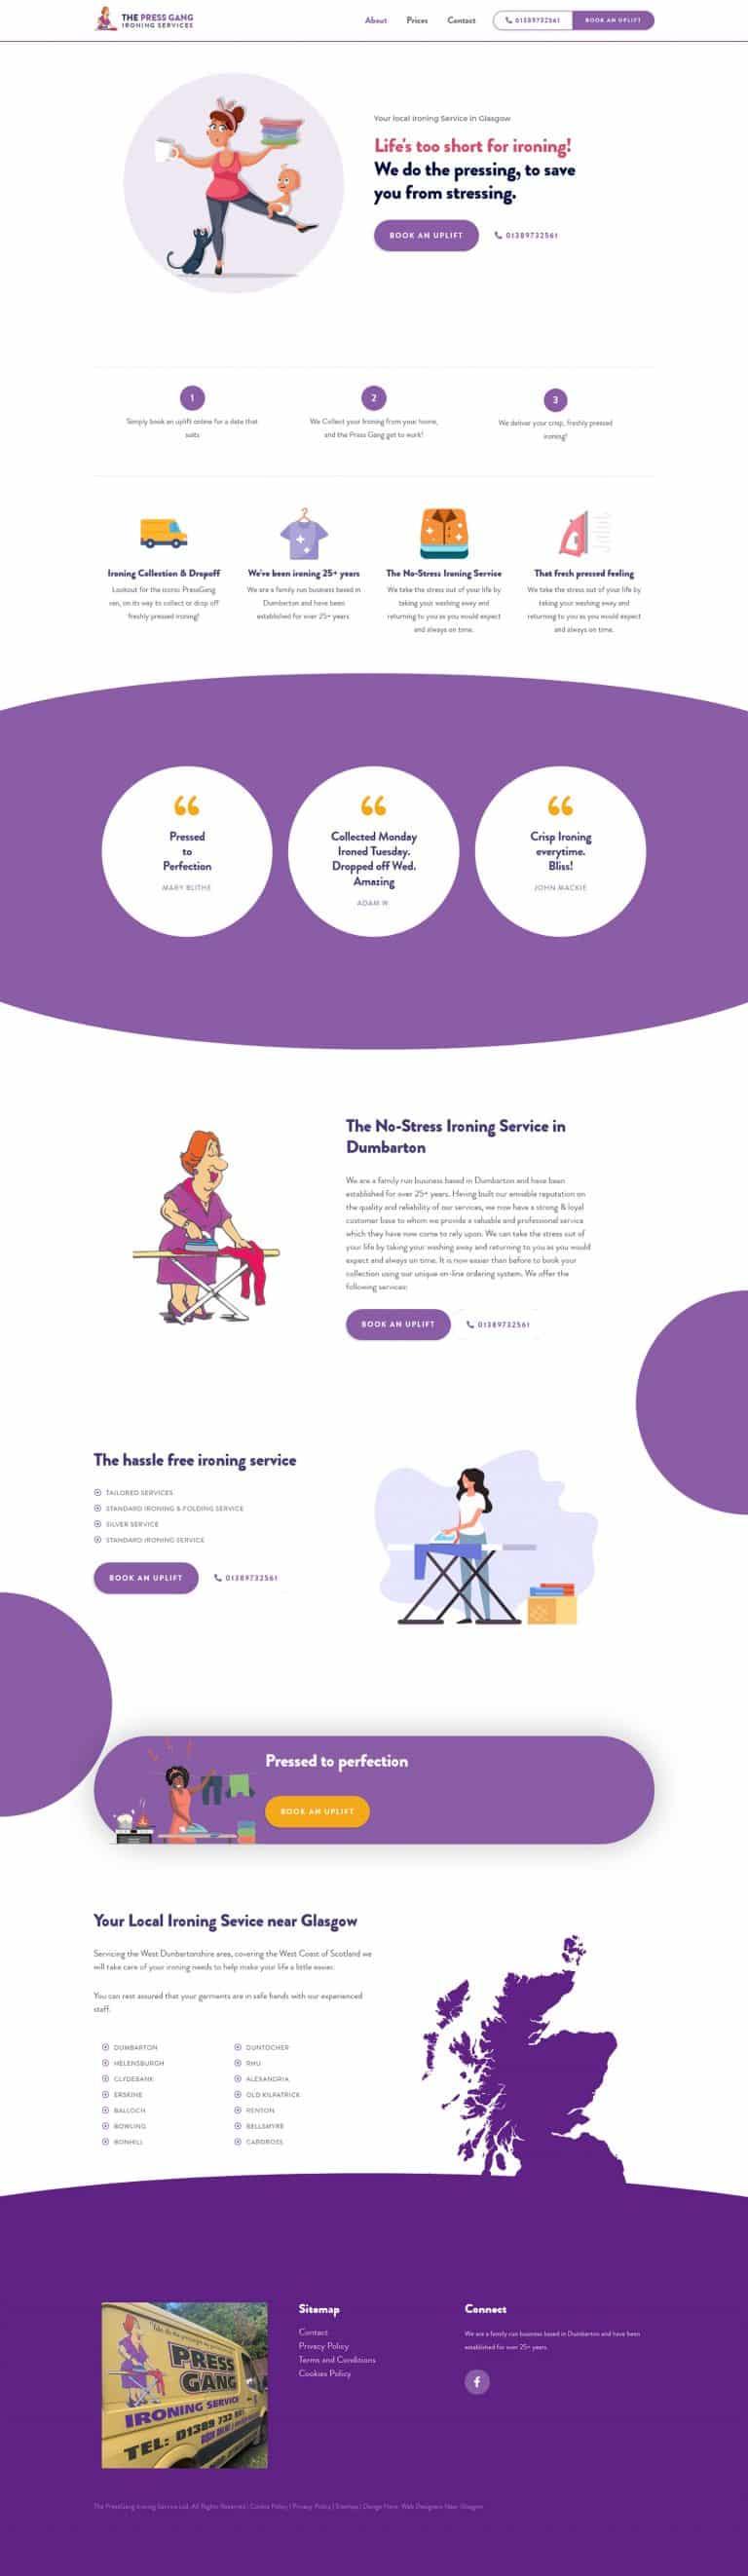 business website designers in Dumbarton